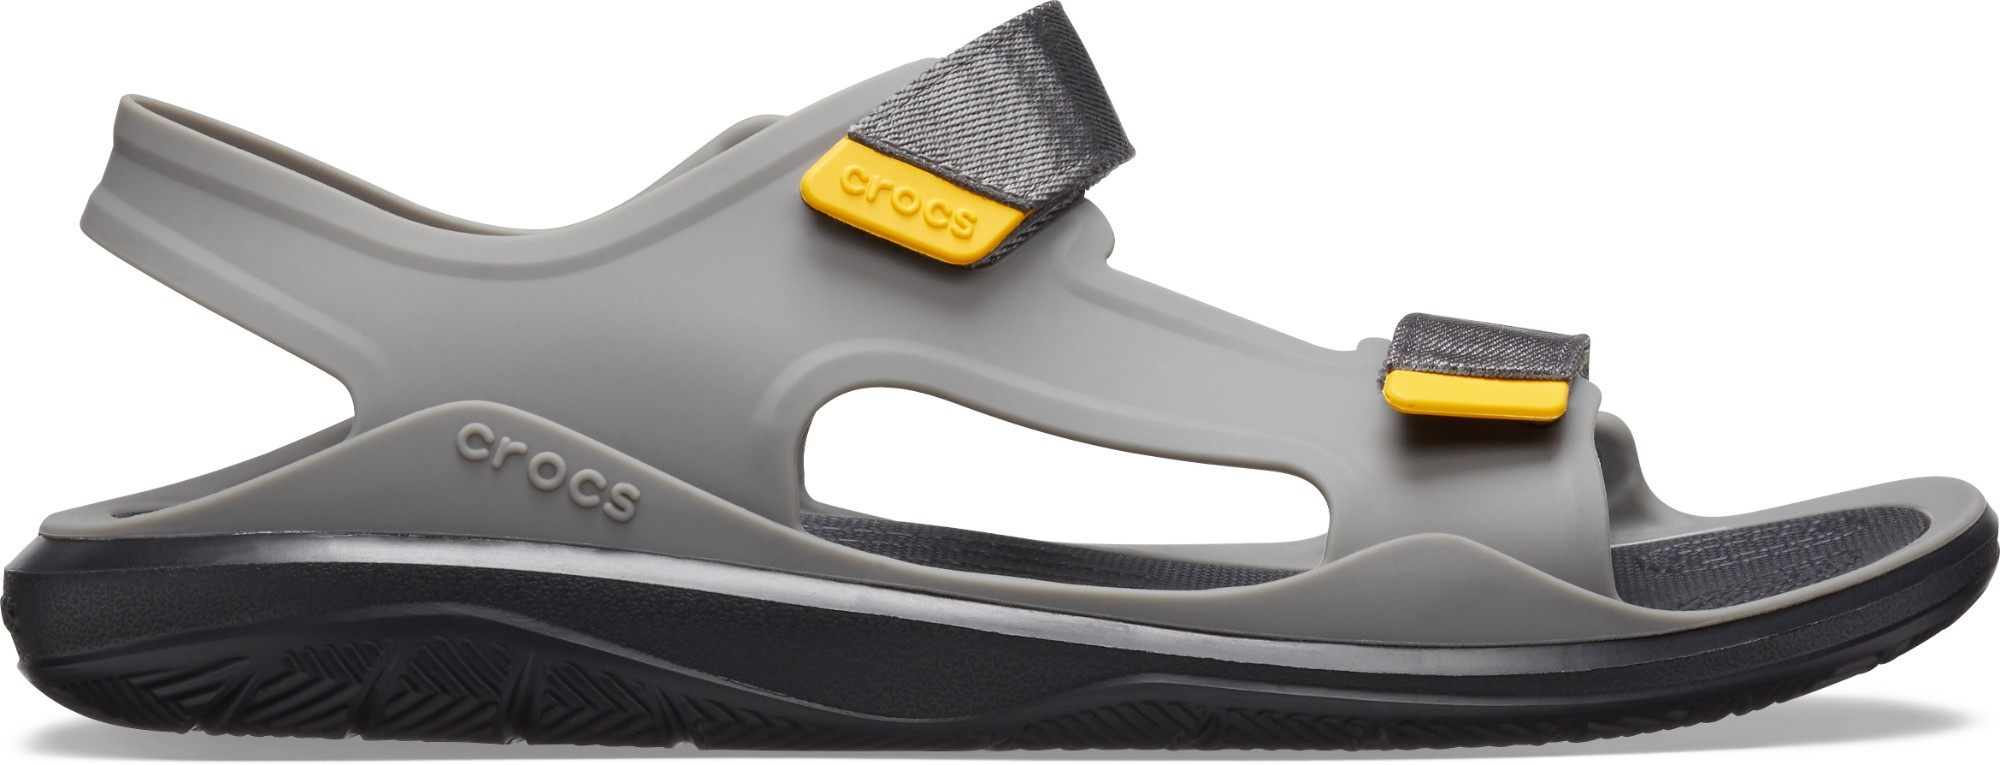 Crocs™ Swiftwater Molded Expedition Sandal Slate Grey/Black 43,5